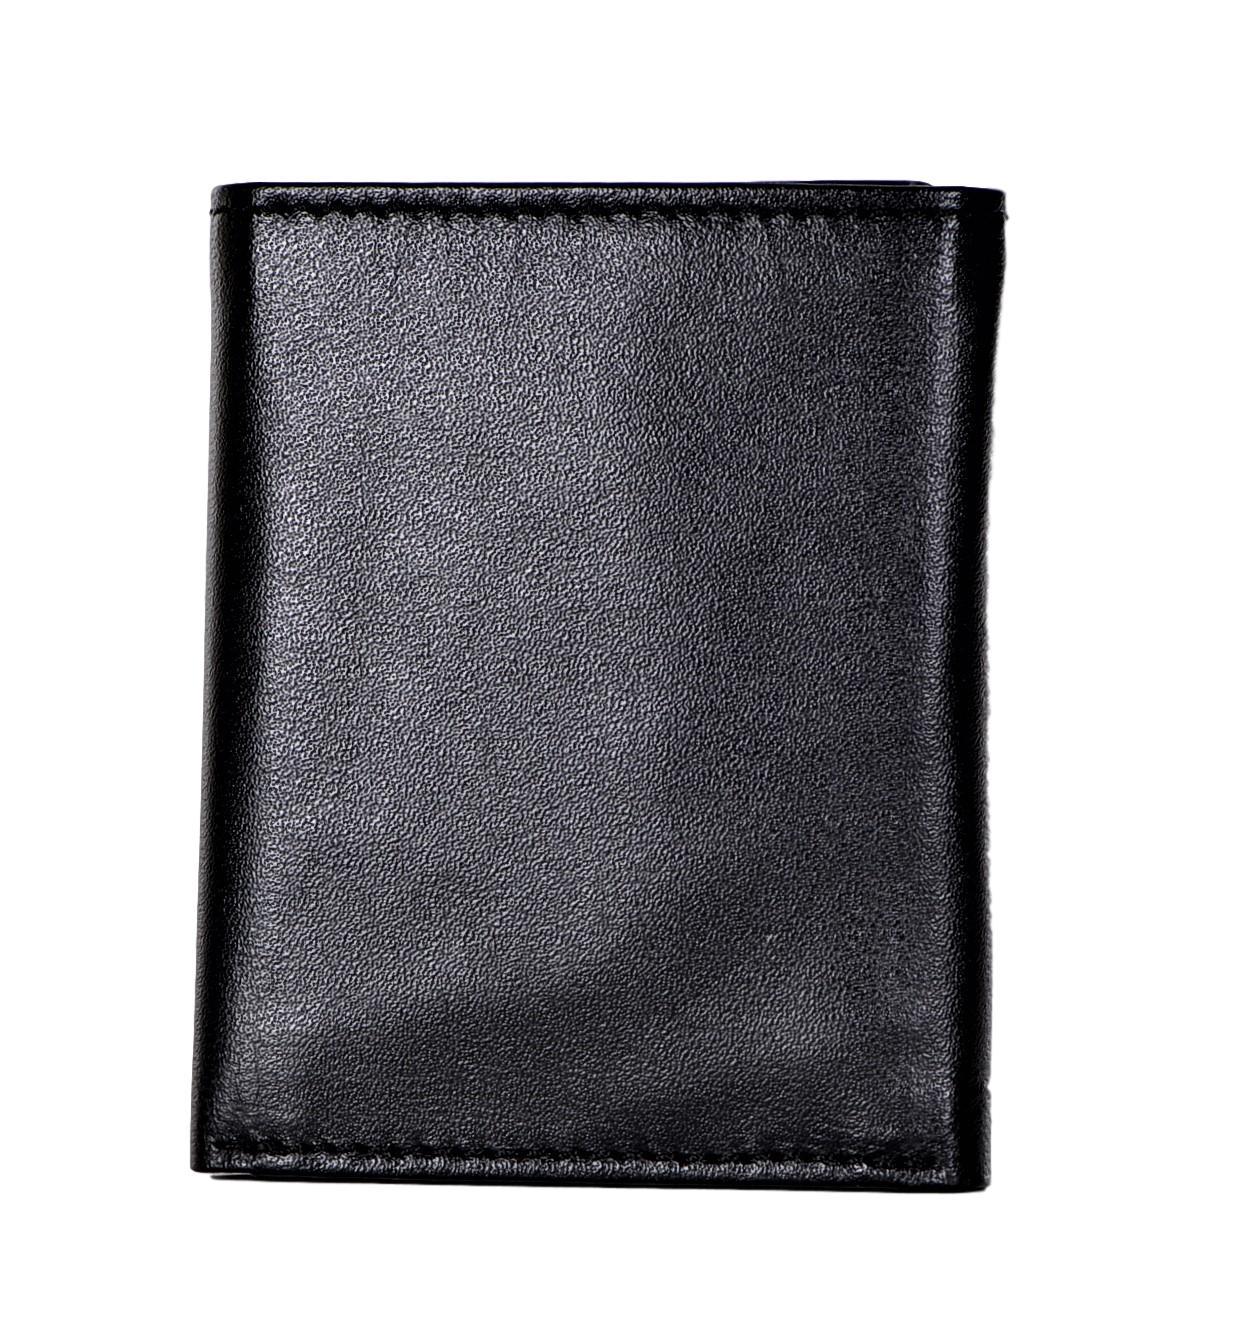 Tahari-Men-039-s-RFID-Security-Blocking-Leather-Glove-Trifold-Wallet thumbnail 8